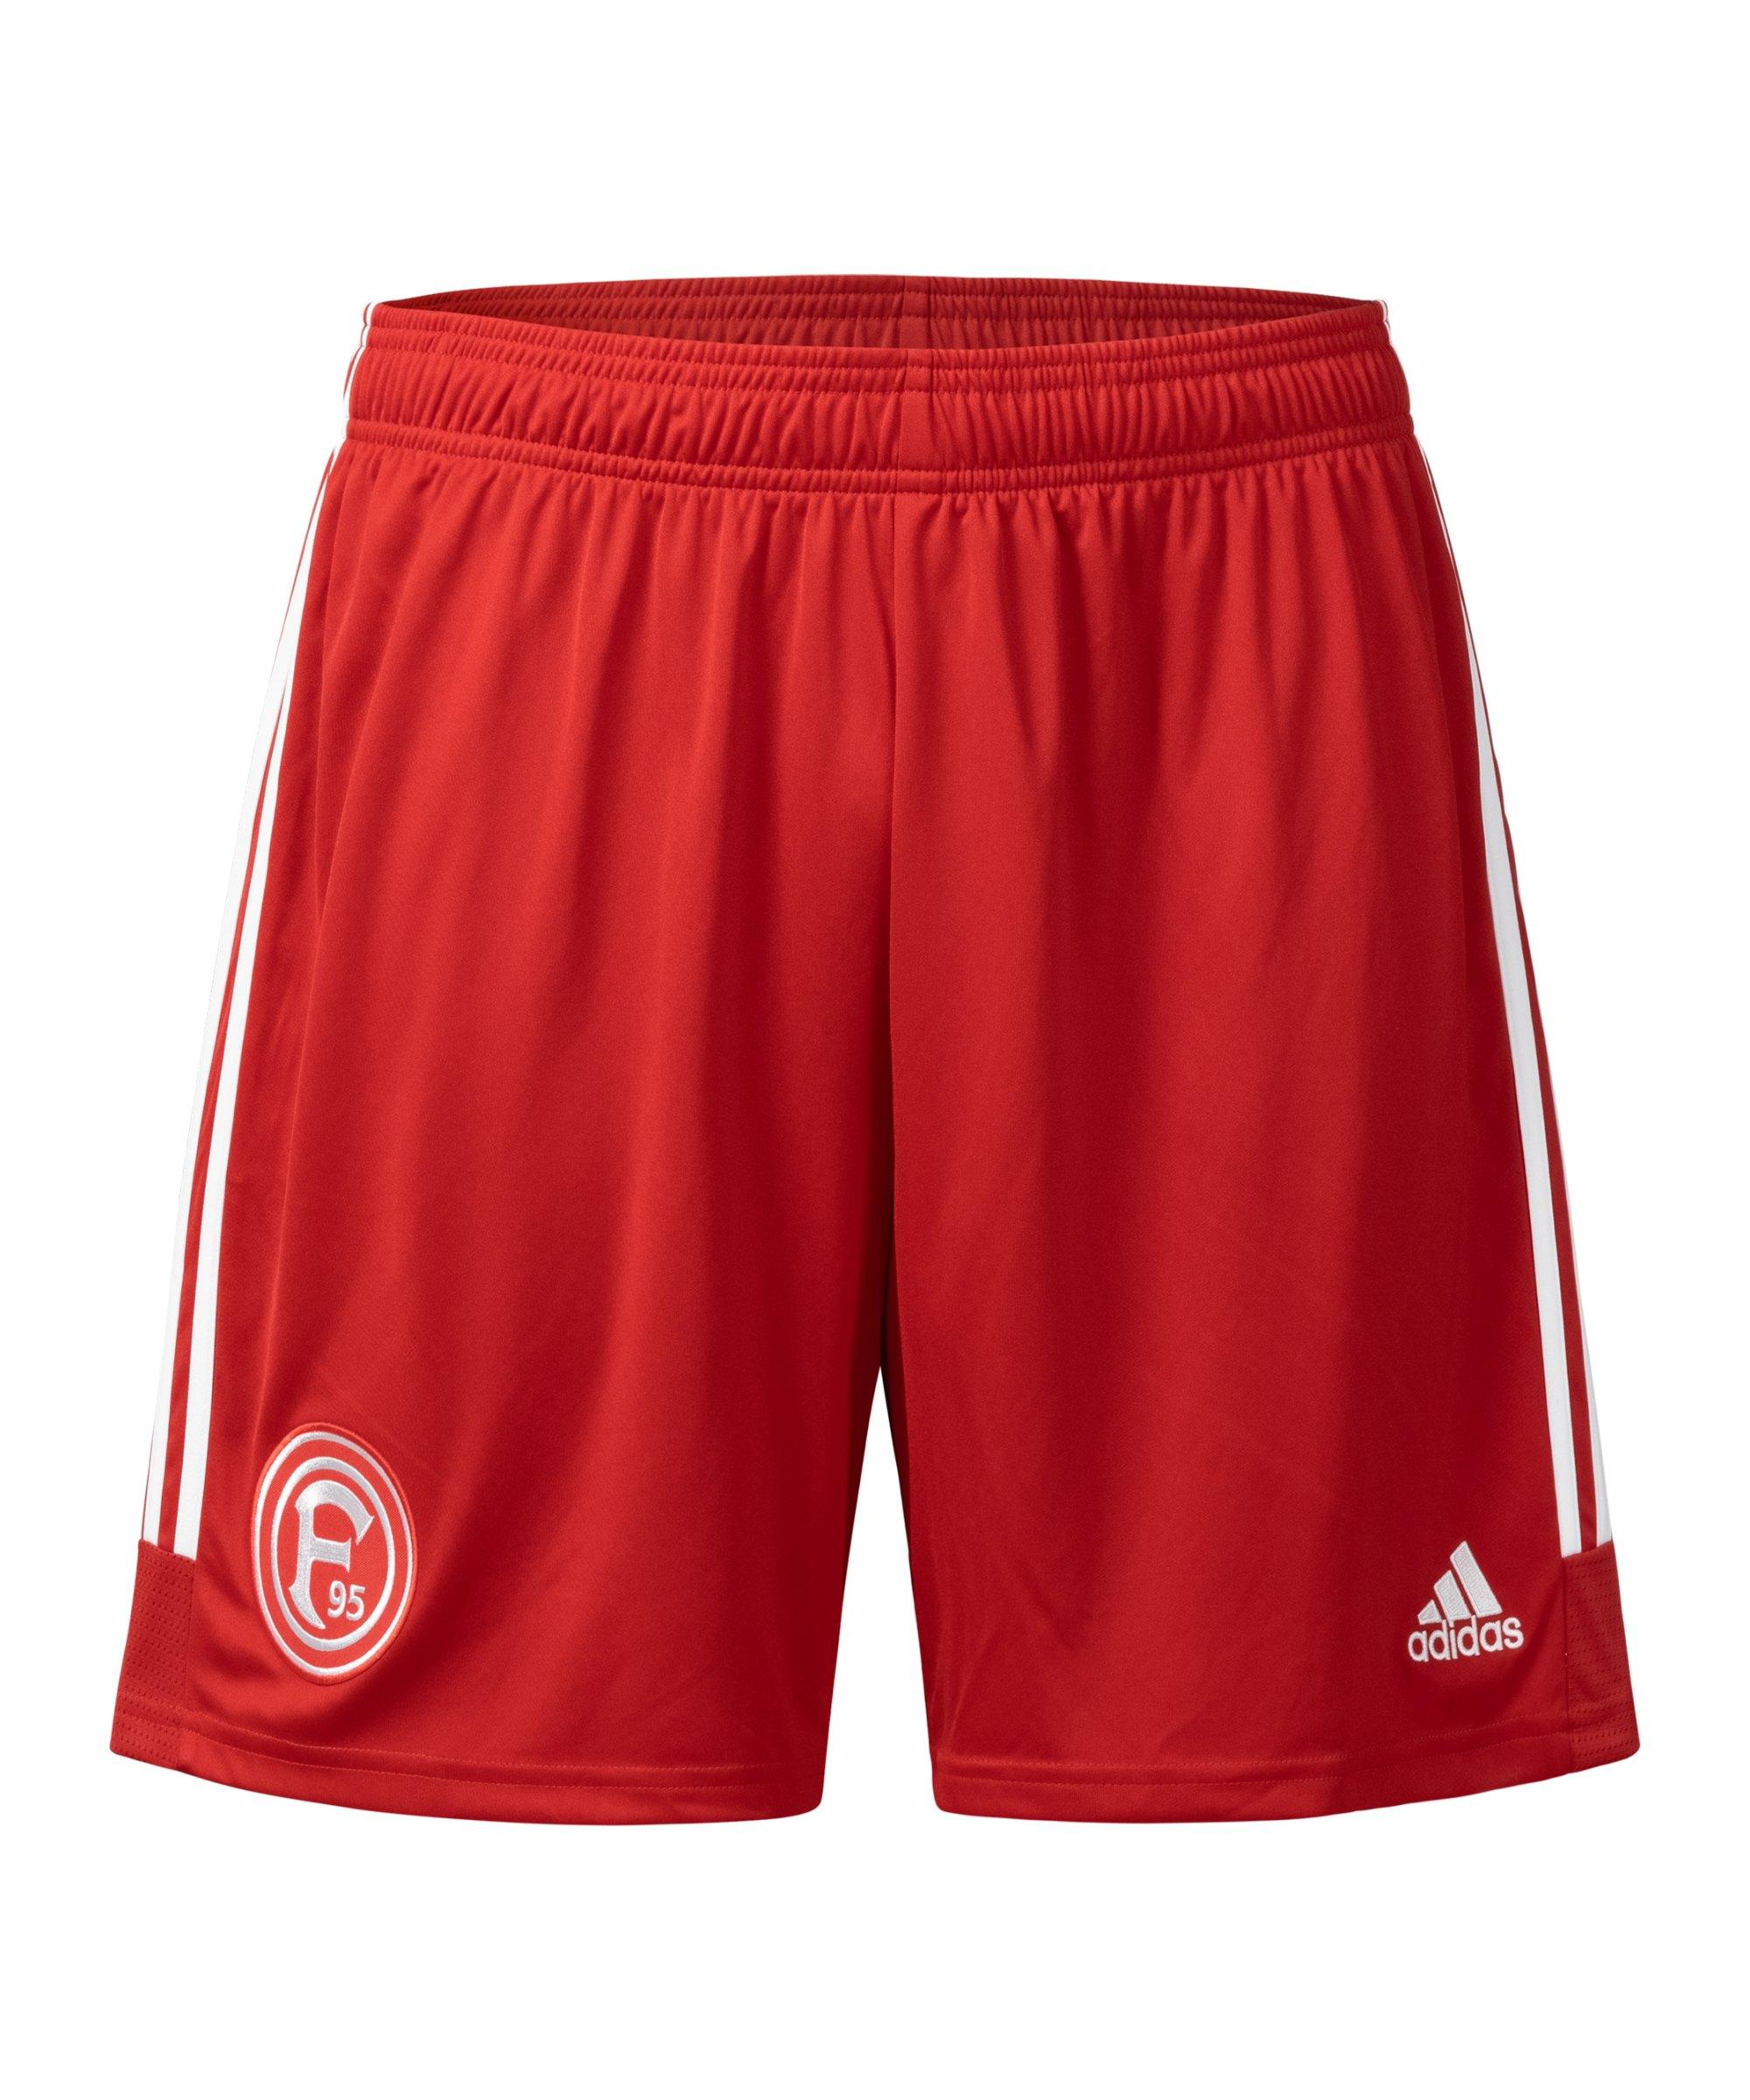 adidas Fortuna Düsseldorf Short Home 2021/2022 Rot - rot